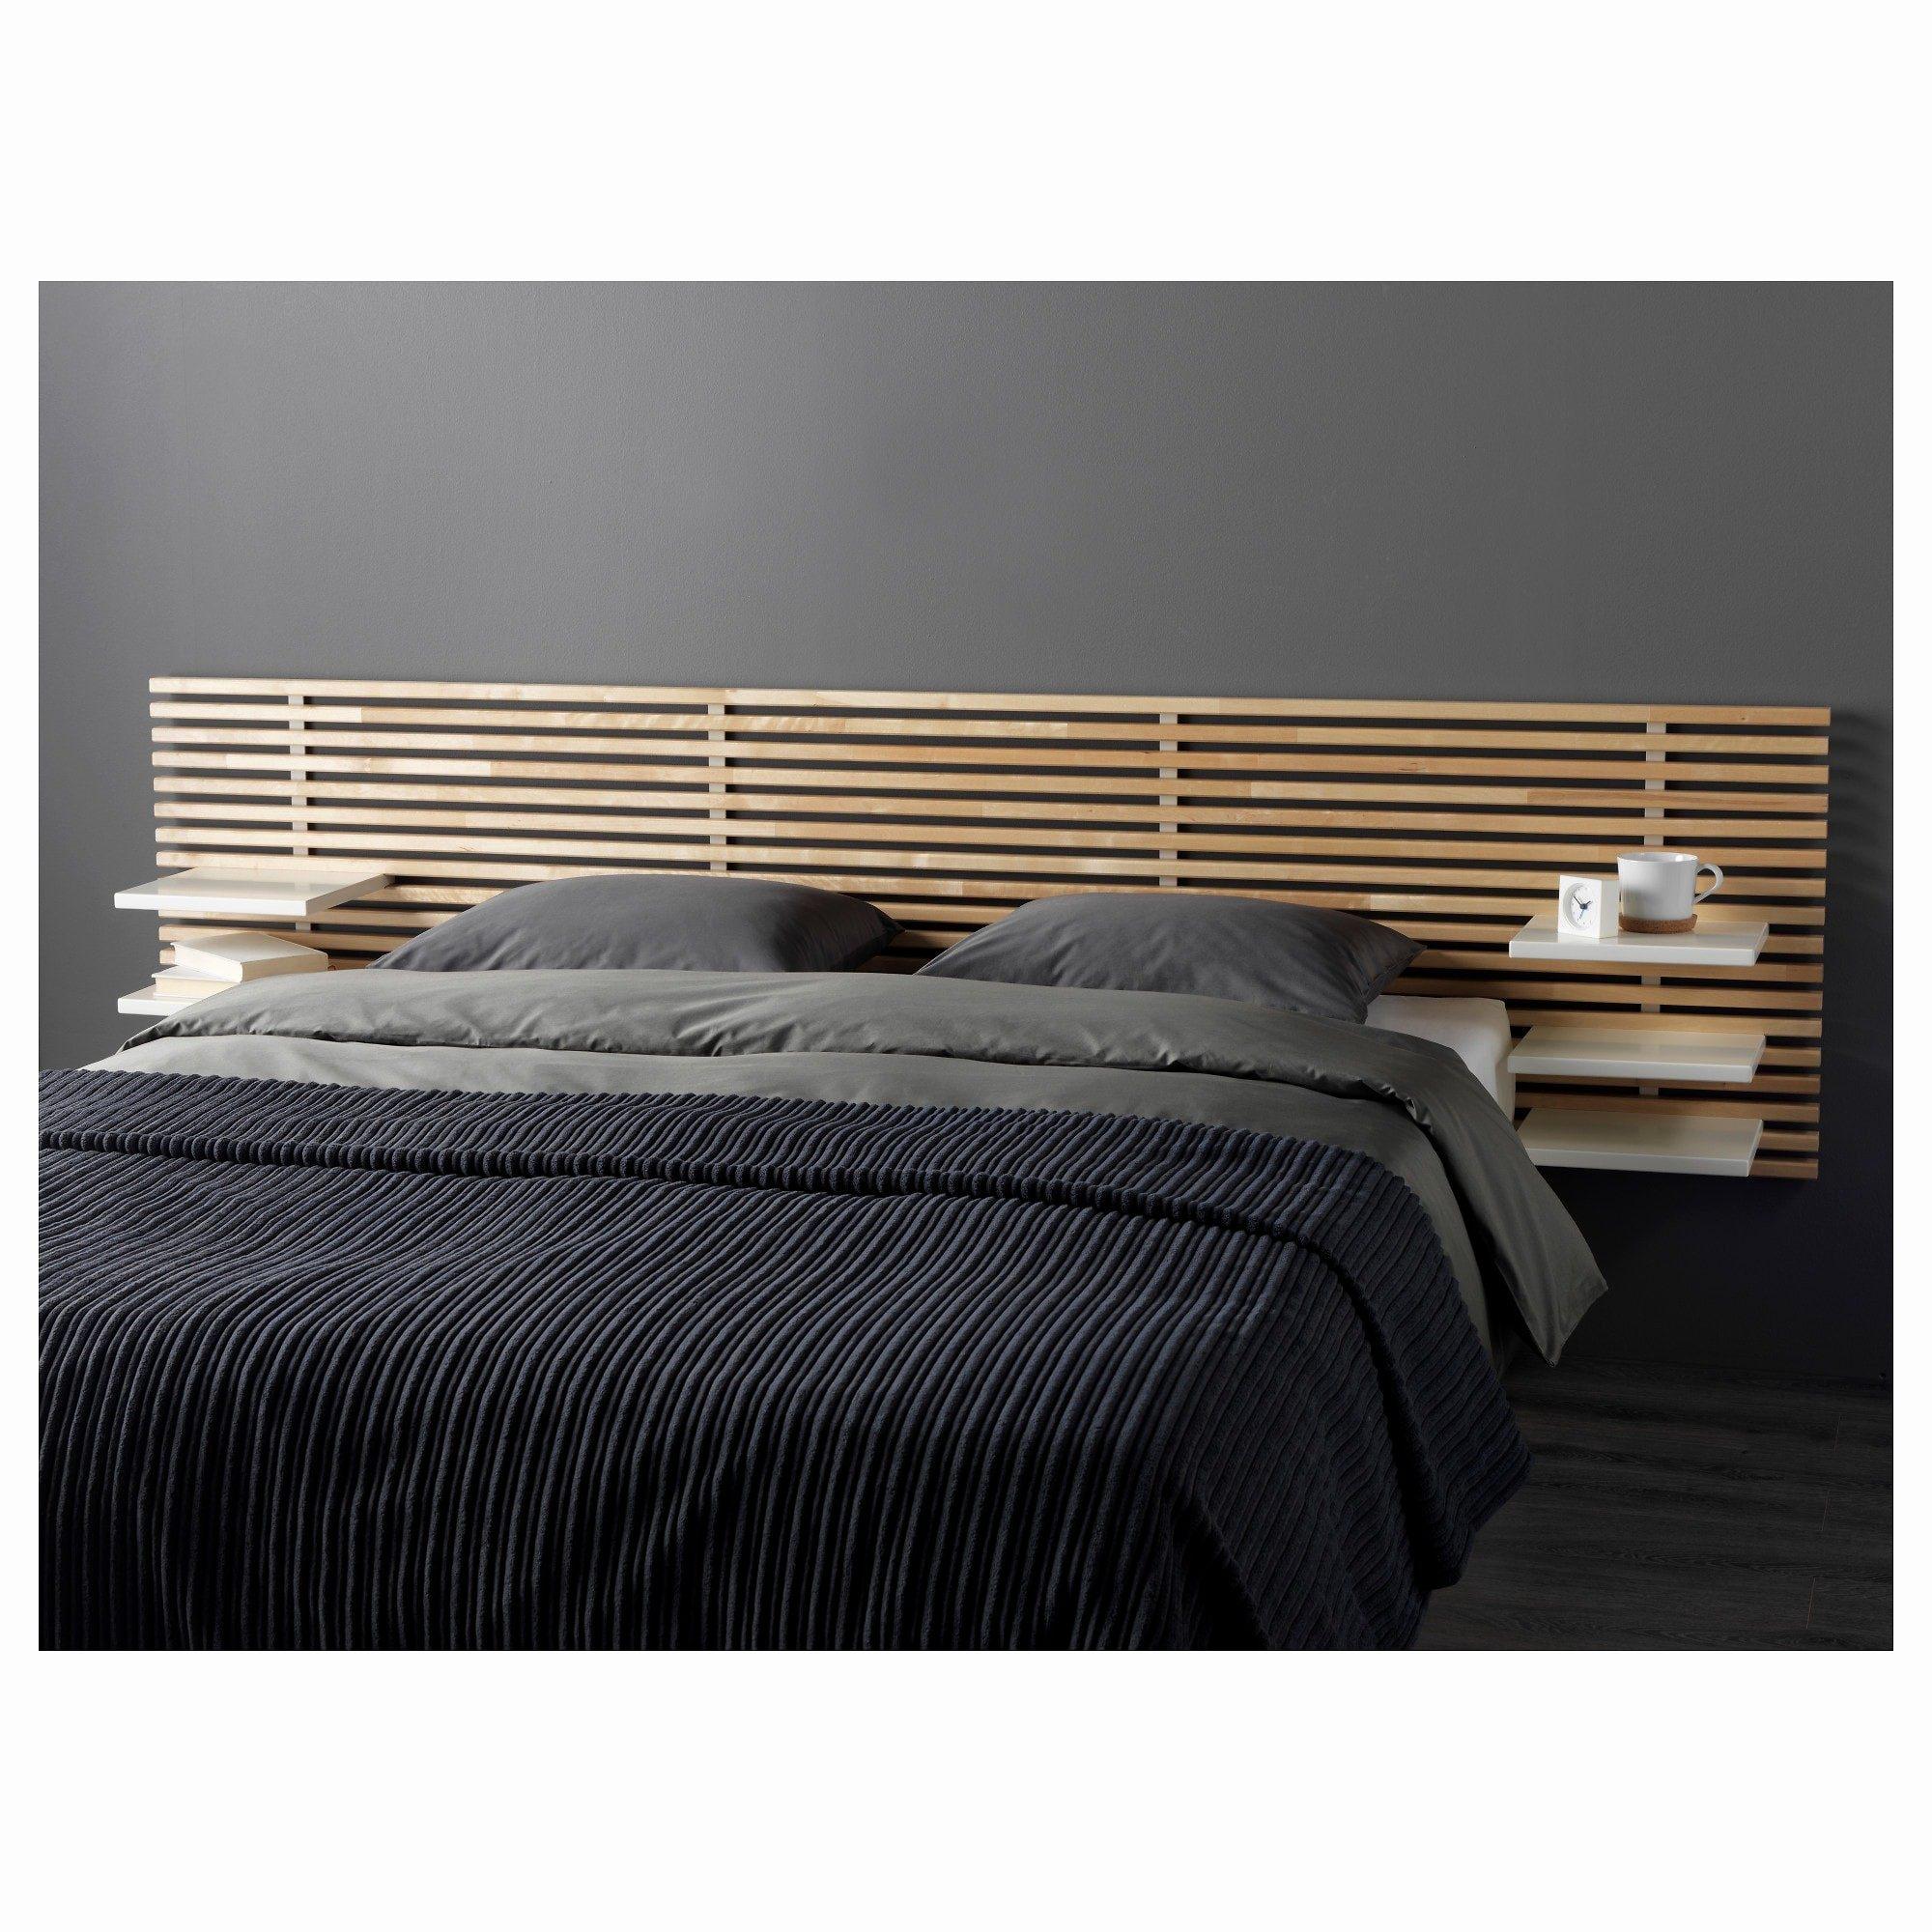 Tete De Lit Tissu Ikea Inspiré Tete De Lit Zen Fabulous Full Size